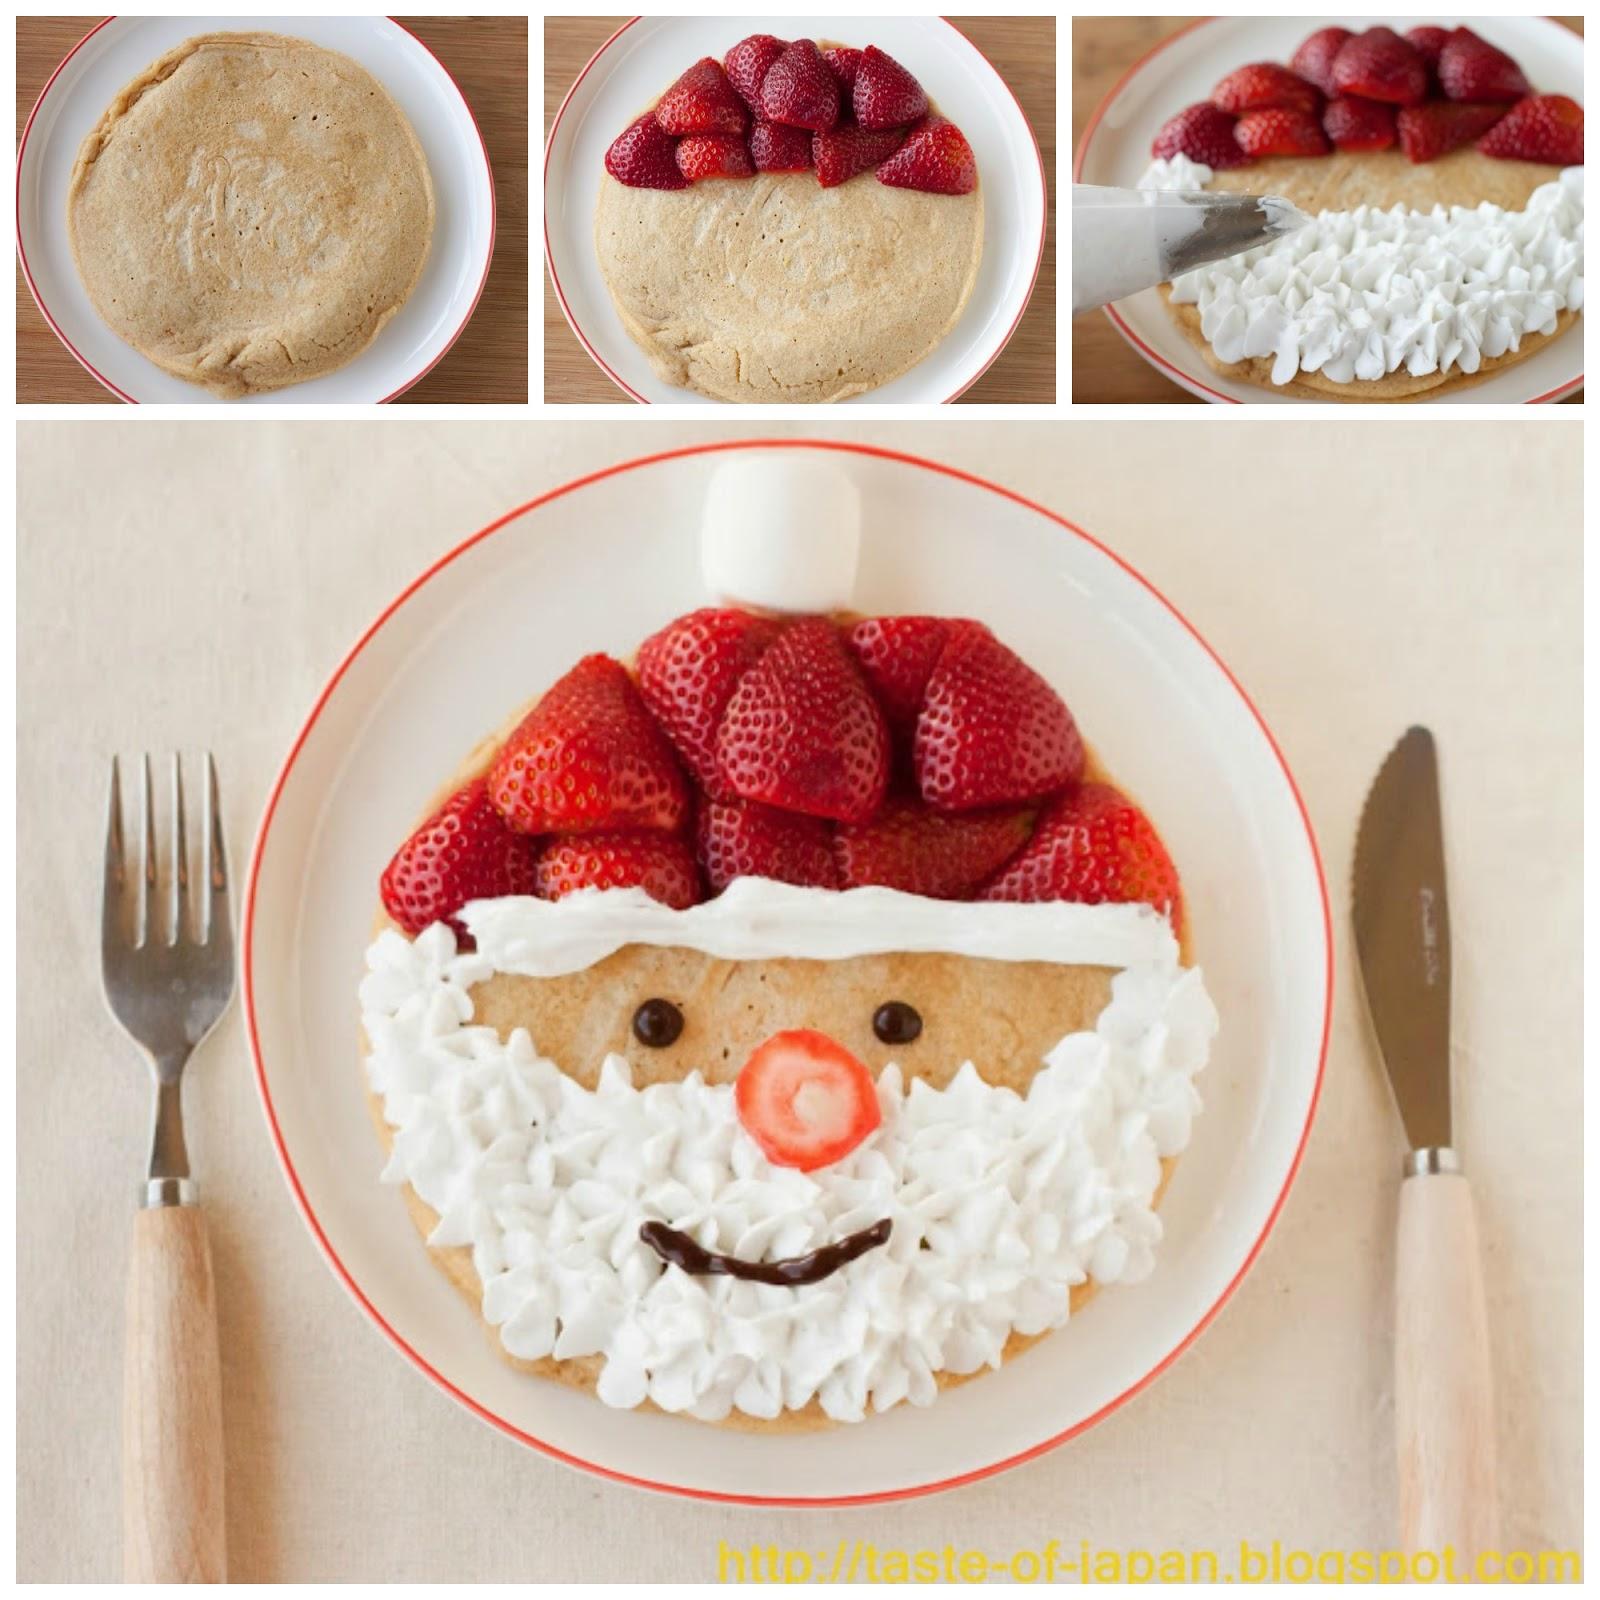 Fun Finds Friday with Christmas Fun Food & DIY Craft Ideas ...